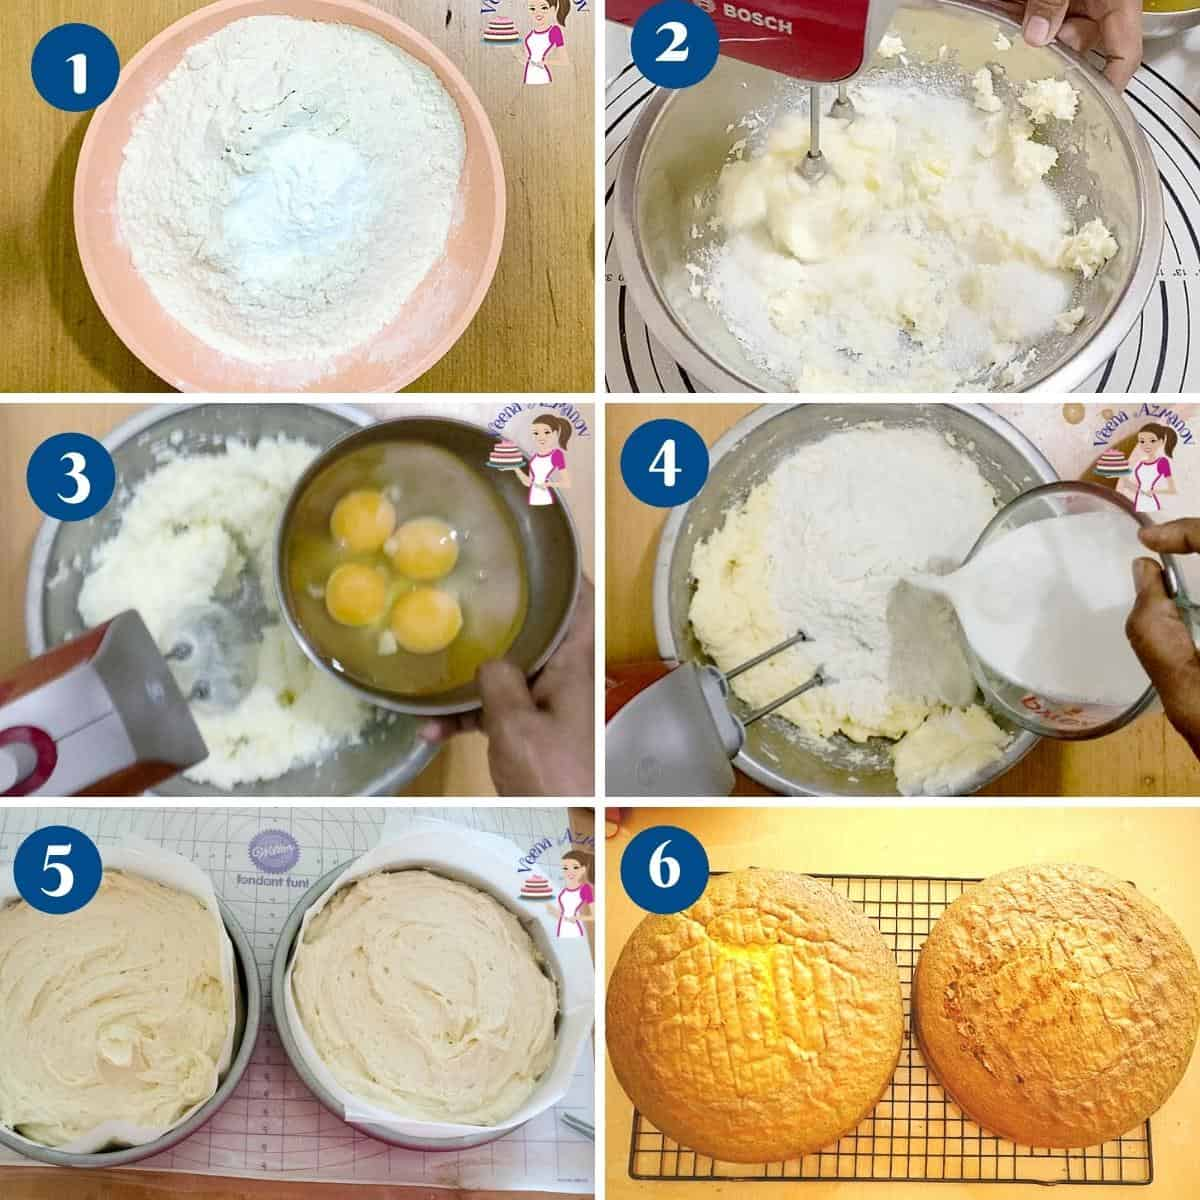 Progress pictures collage making a vanilla sponge cake.